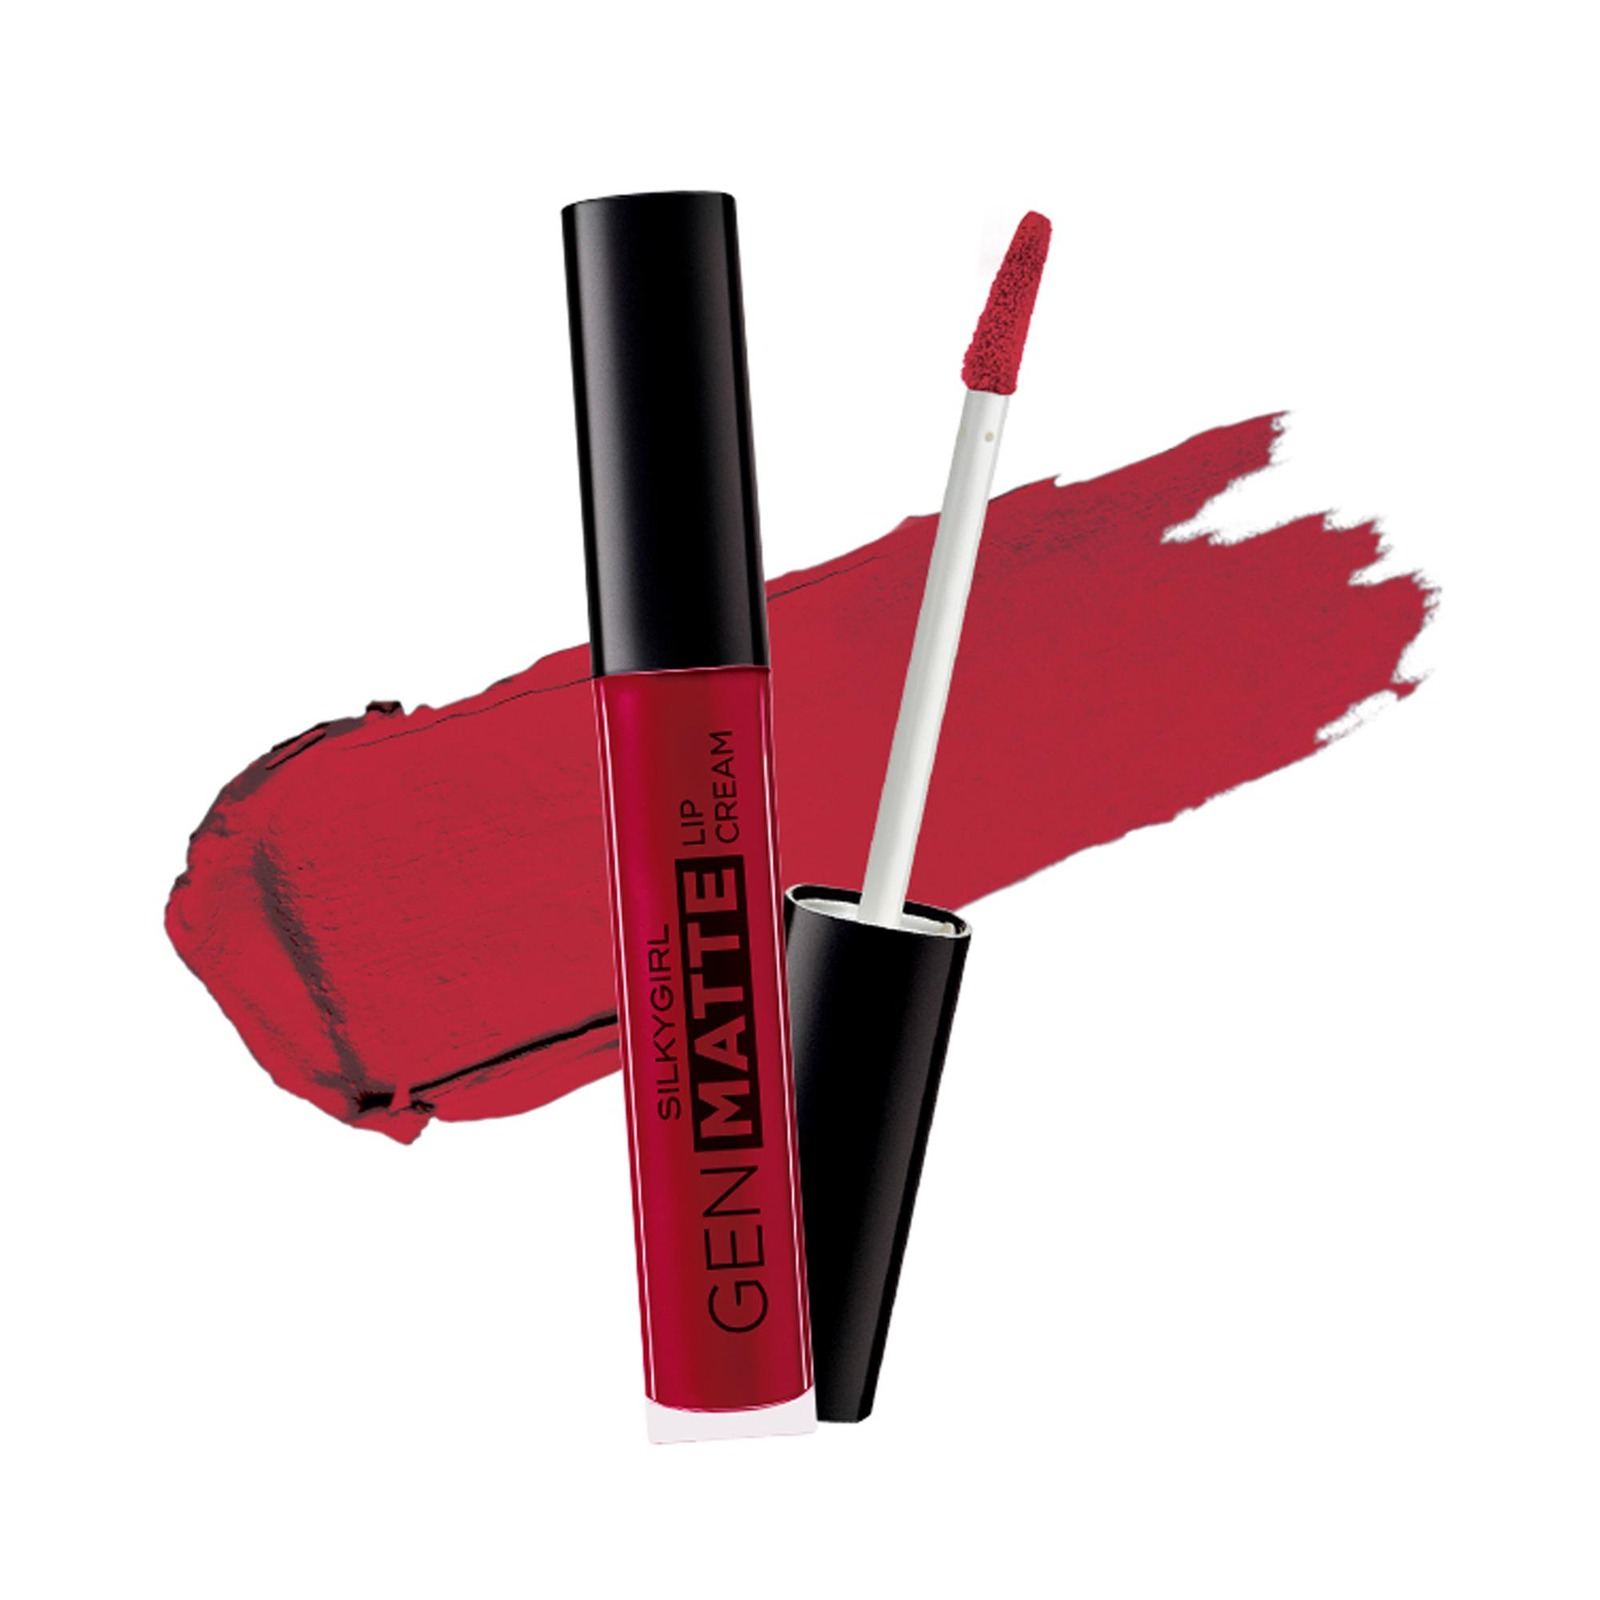 SILKYGIRL Gen Matte Lip Cream 08 Red Rebel